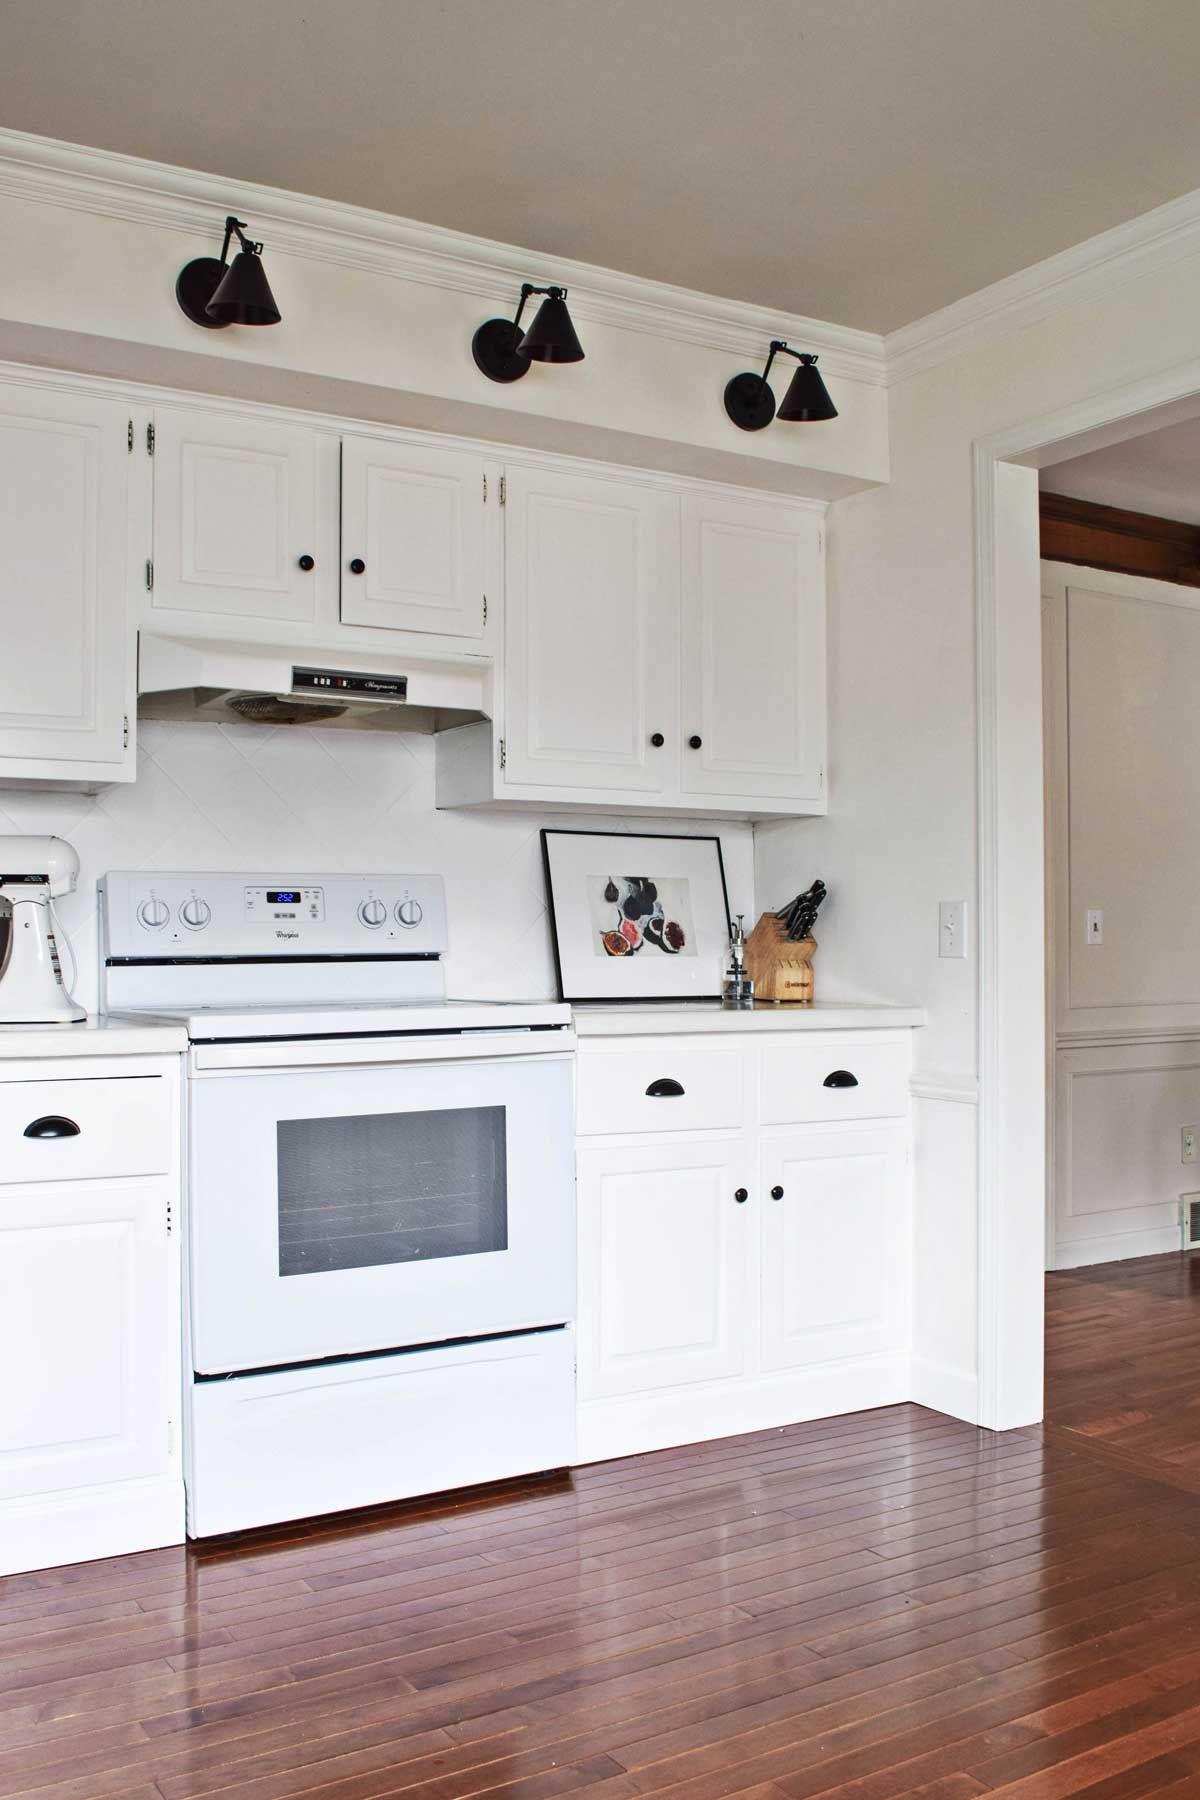 Rachel Schultz Building Out The Toe Kicks On Kitchen Cabinets In 2020 Kitchen Cabinets Without Toe Kick Base Cabinets Kitchen Cabinets